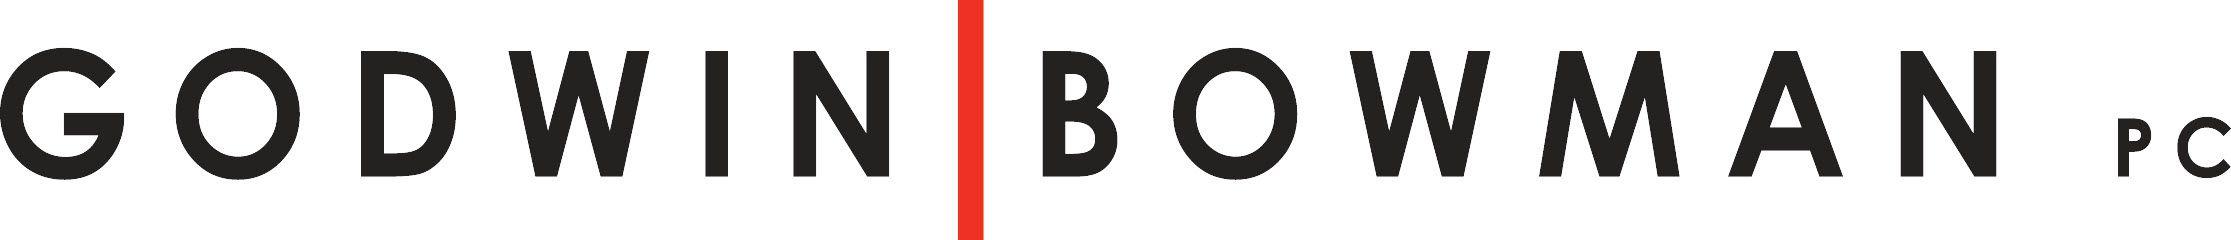 Godwin Bowman PC law firm logo